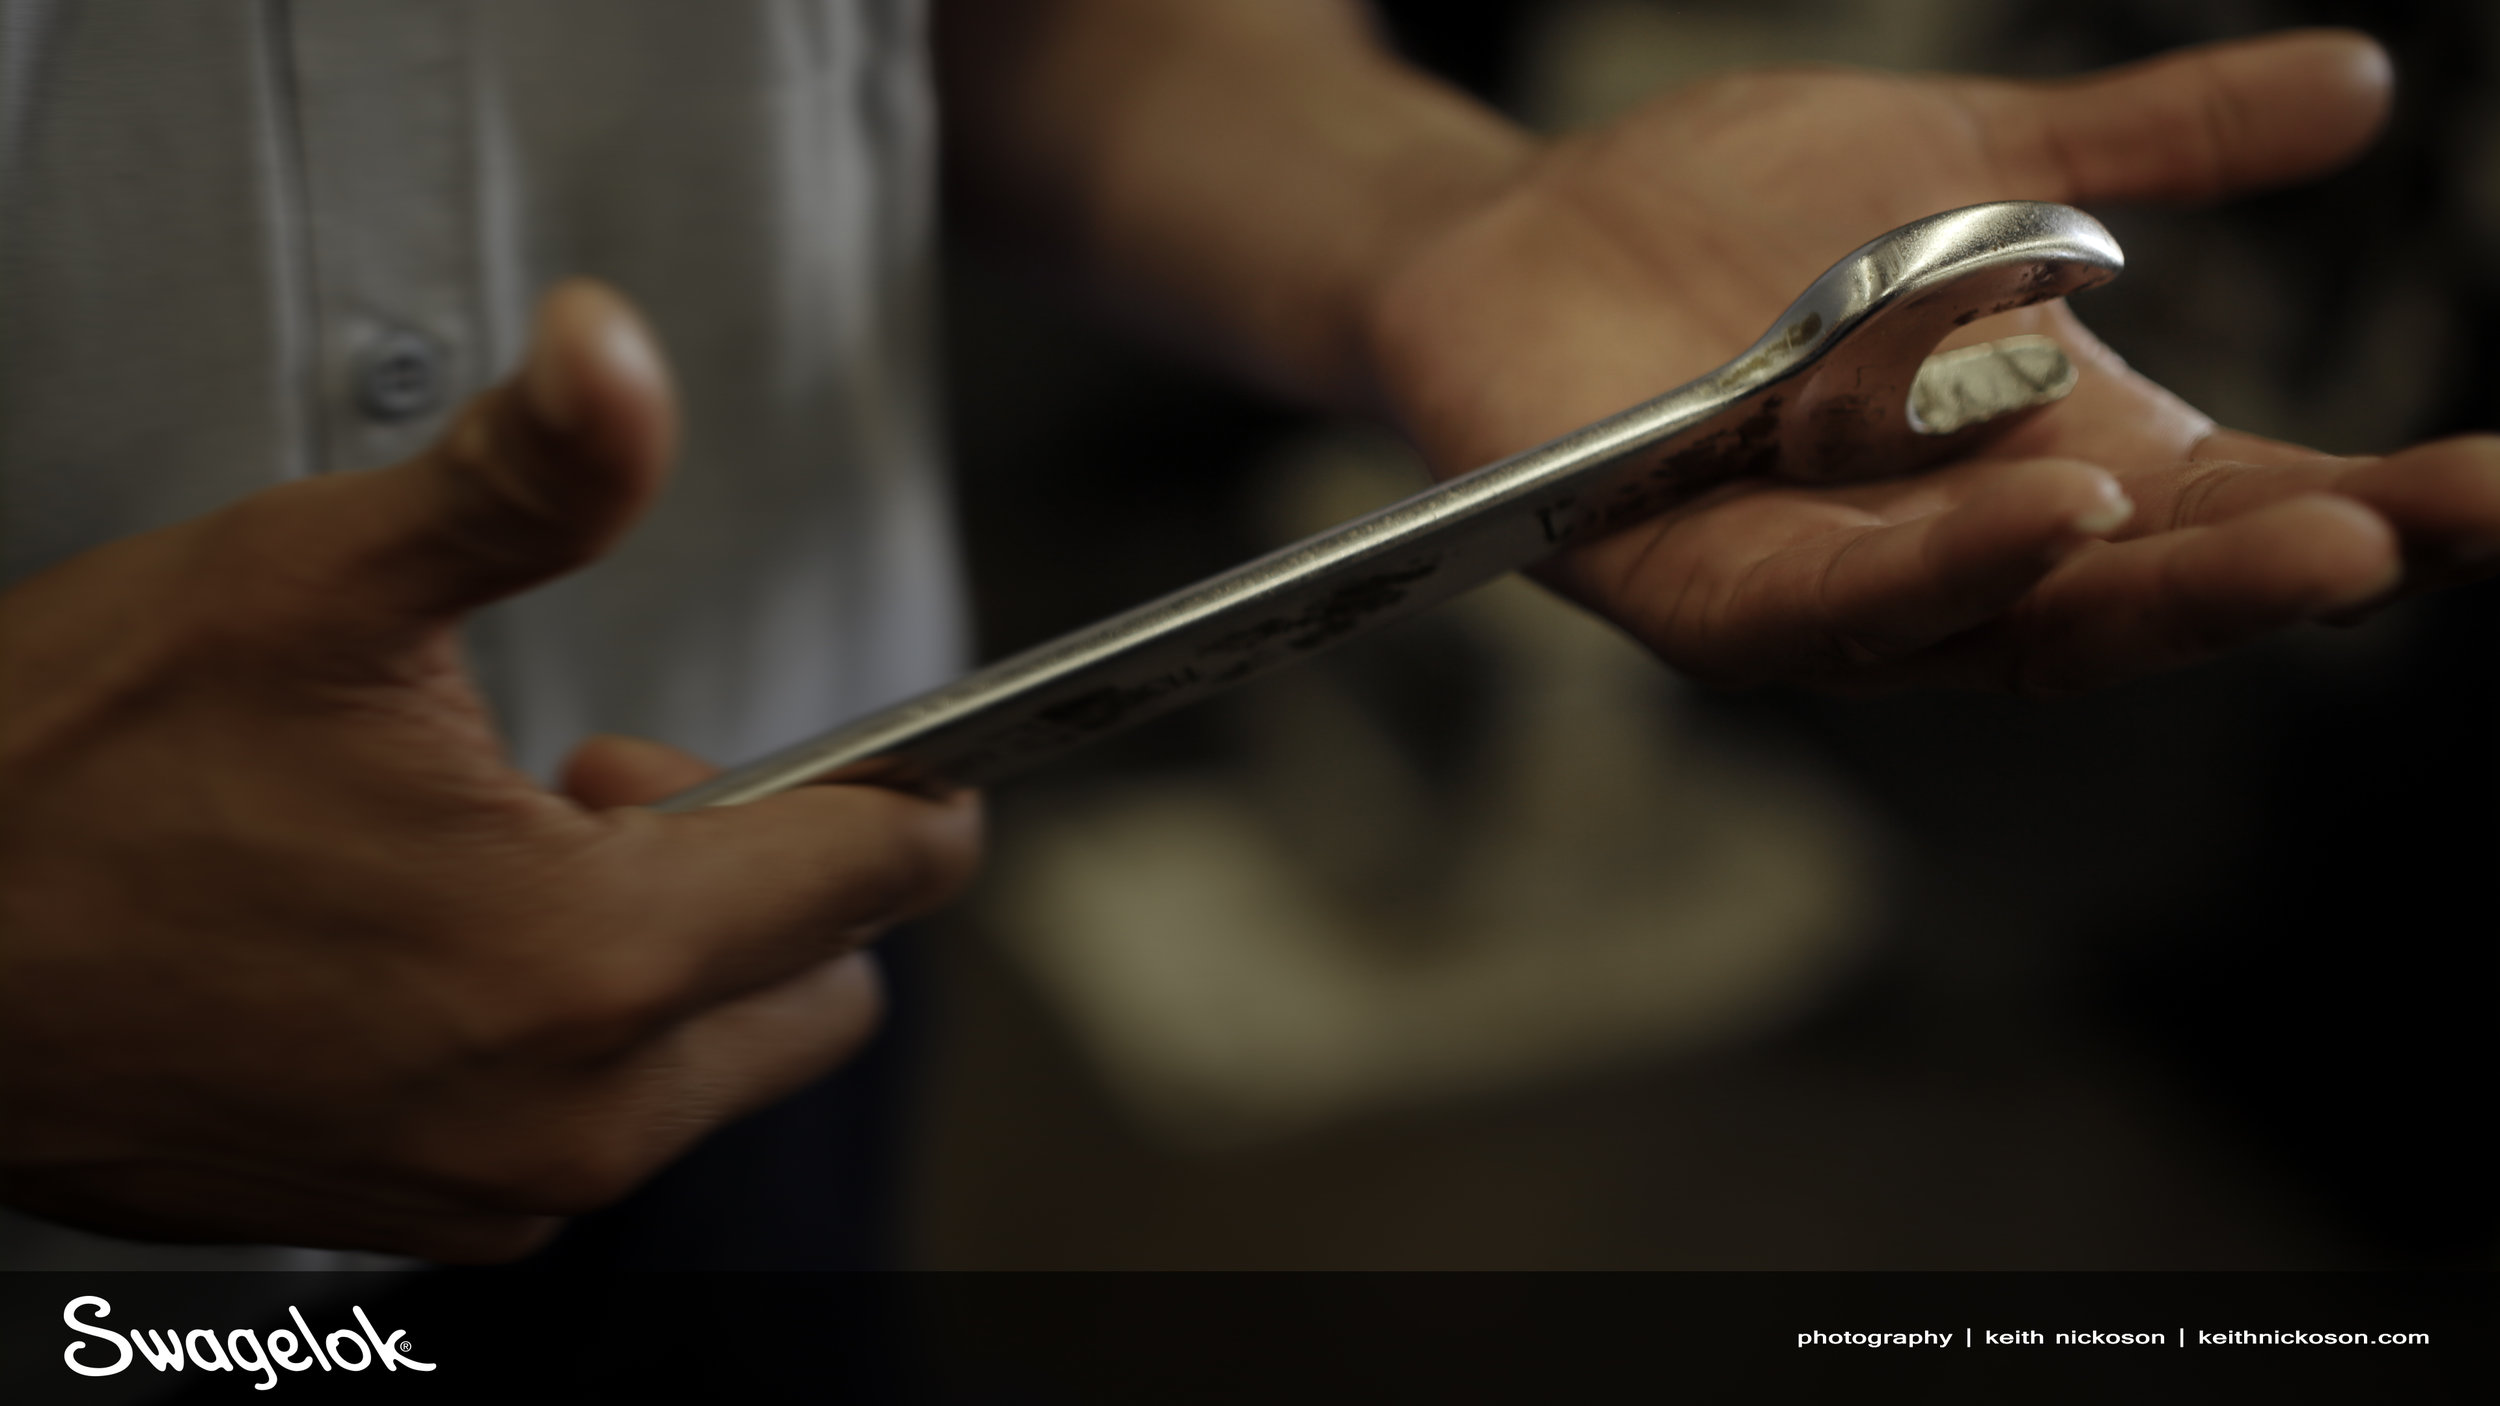 Swagelok Wrench 1 - Keith Nickoson.jpg